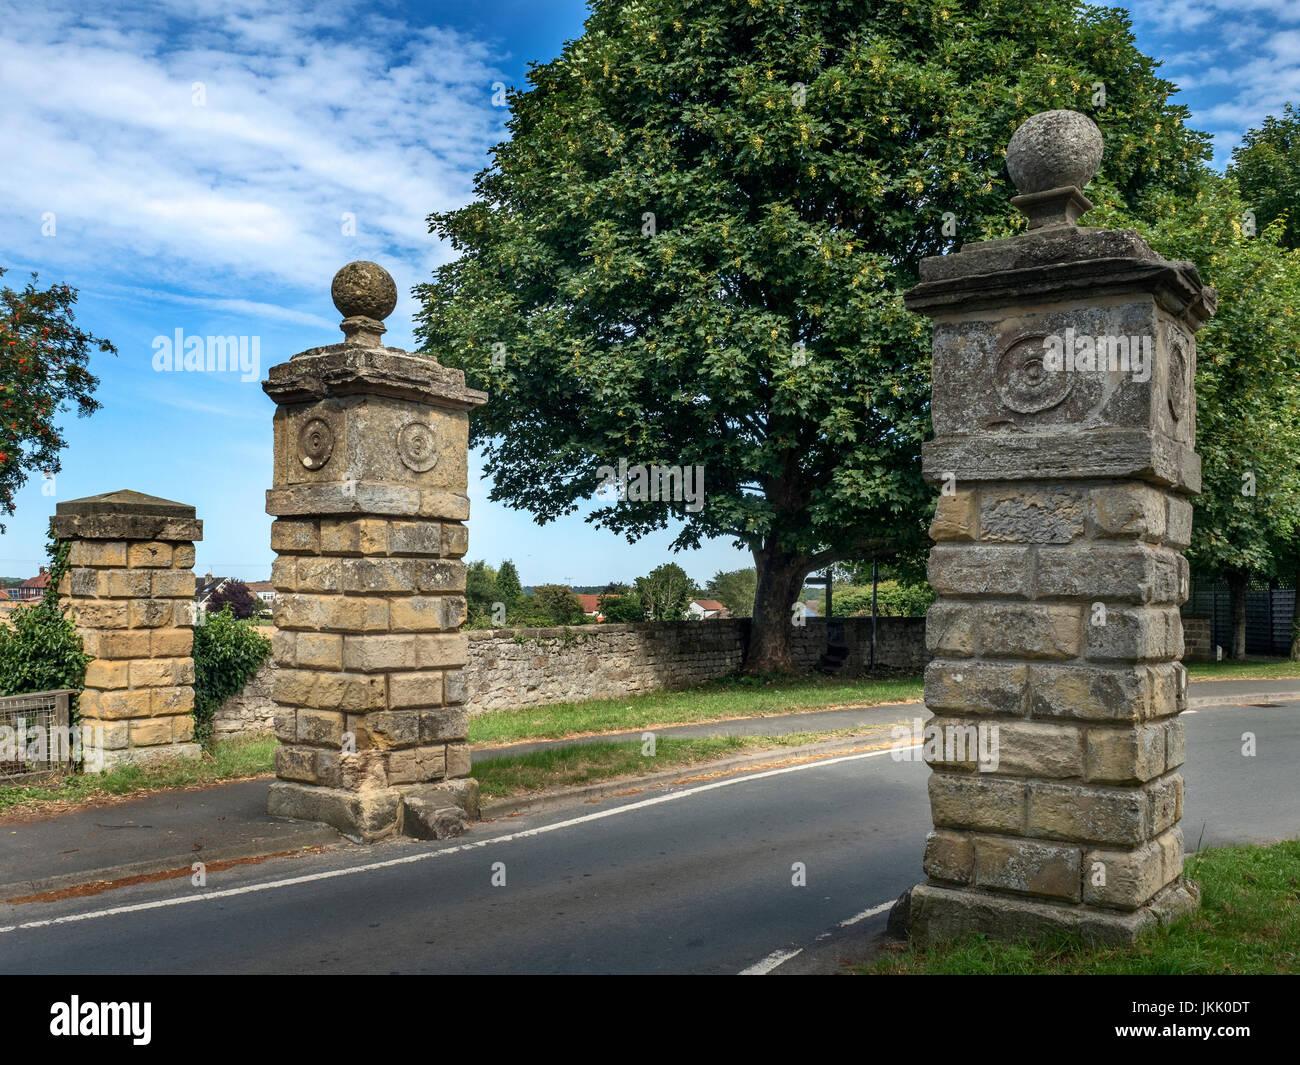 Gate Piers at the Village Entrance Goldsborough near Knaresborough North Yorkshire England - Stock Image